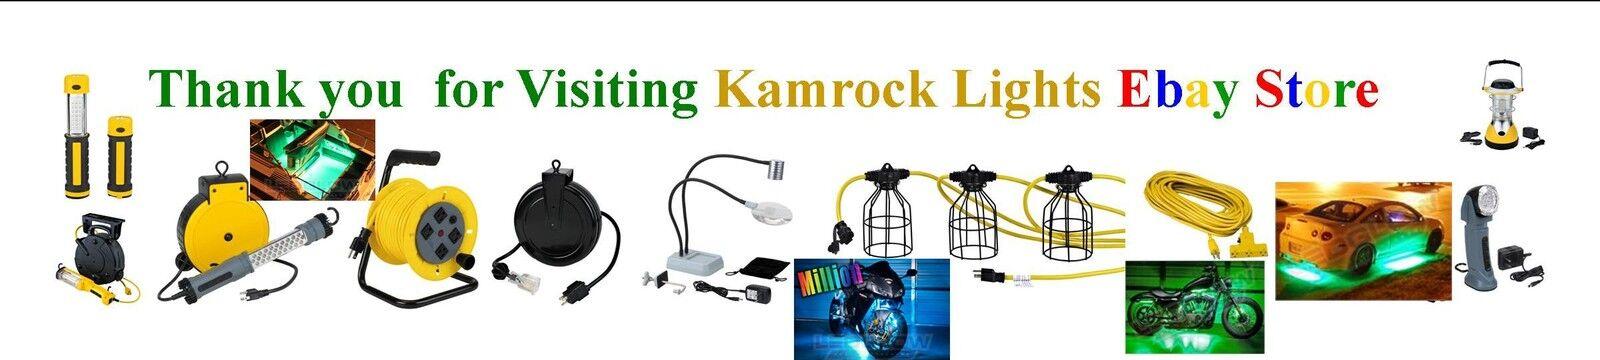 Kamrock Lights